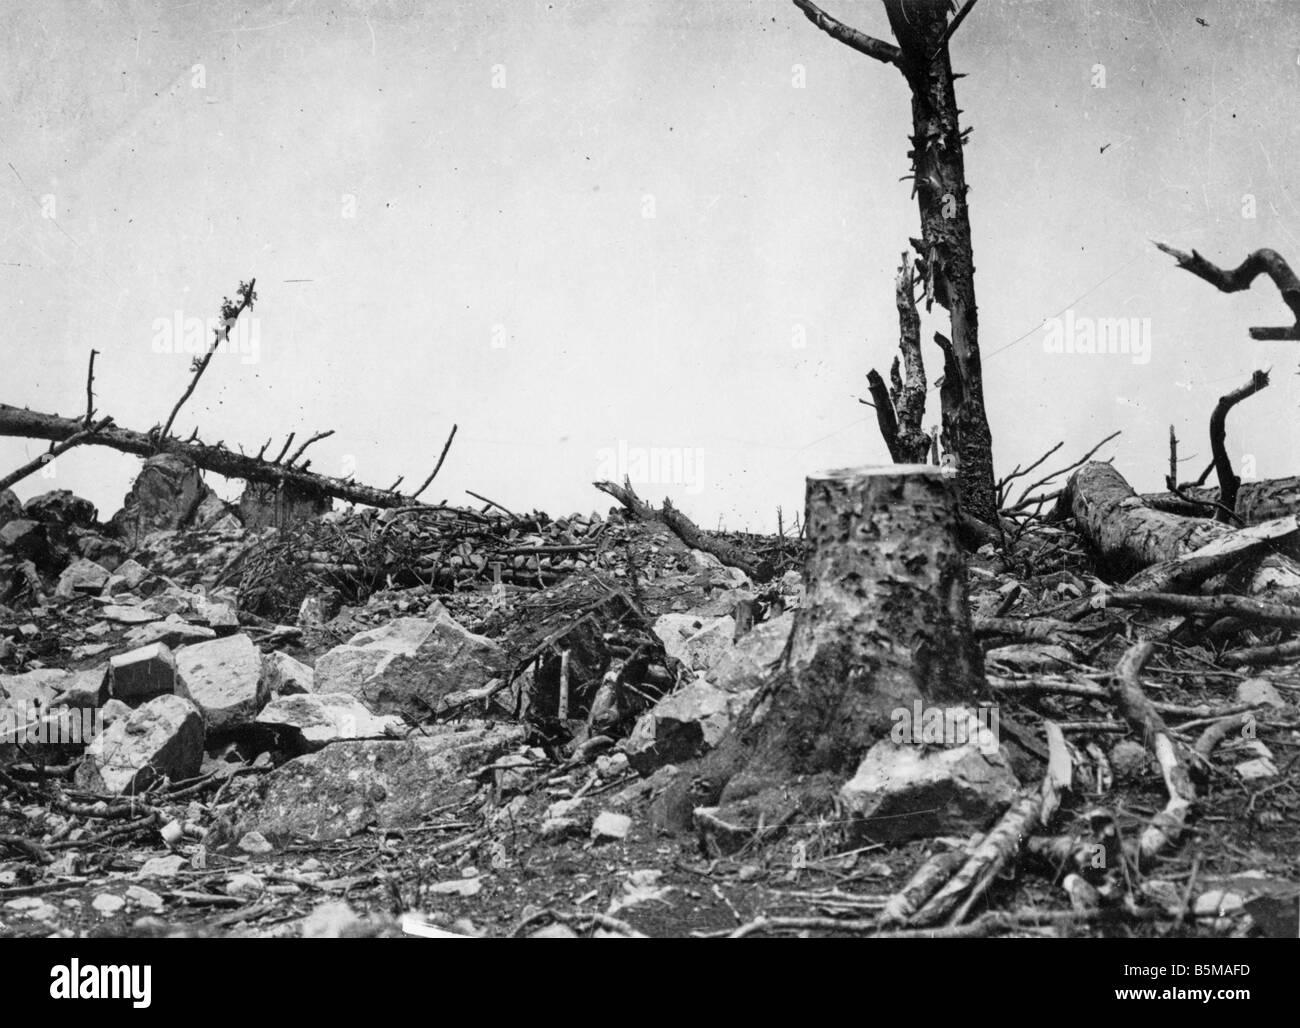 2 G55 W1 1918 25 Hartmannsweilerkopf Photo 1918 Storia Guerra Mondiale 1 fronte occidentale il villaggio Hartmannsweilerkopf Immagini Stock